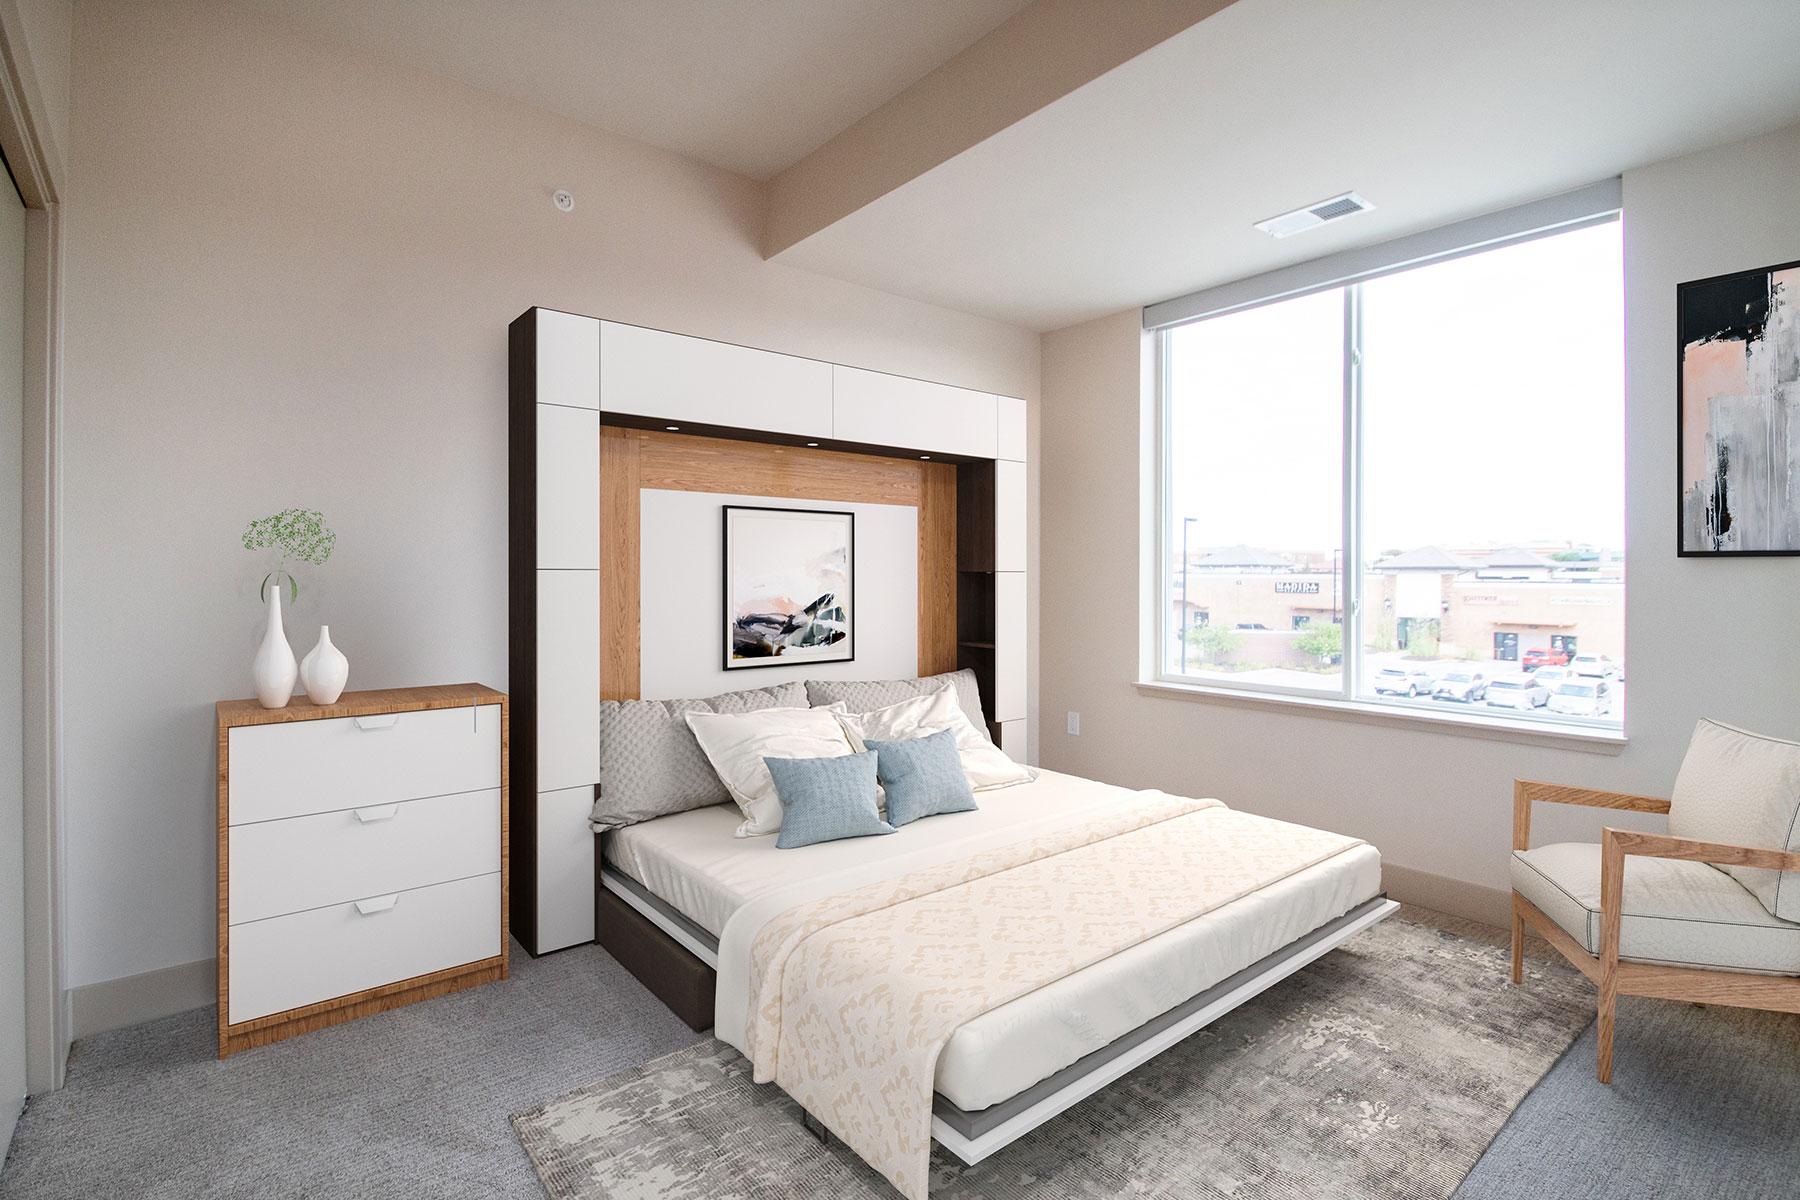 Spacious Bedrooms at Legacy Flats Apartments in Omaha, Nebraska